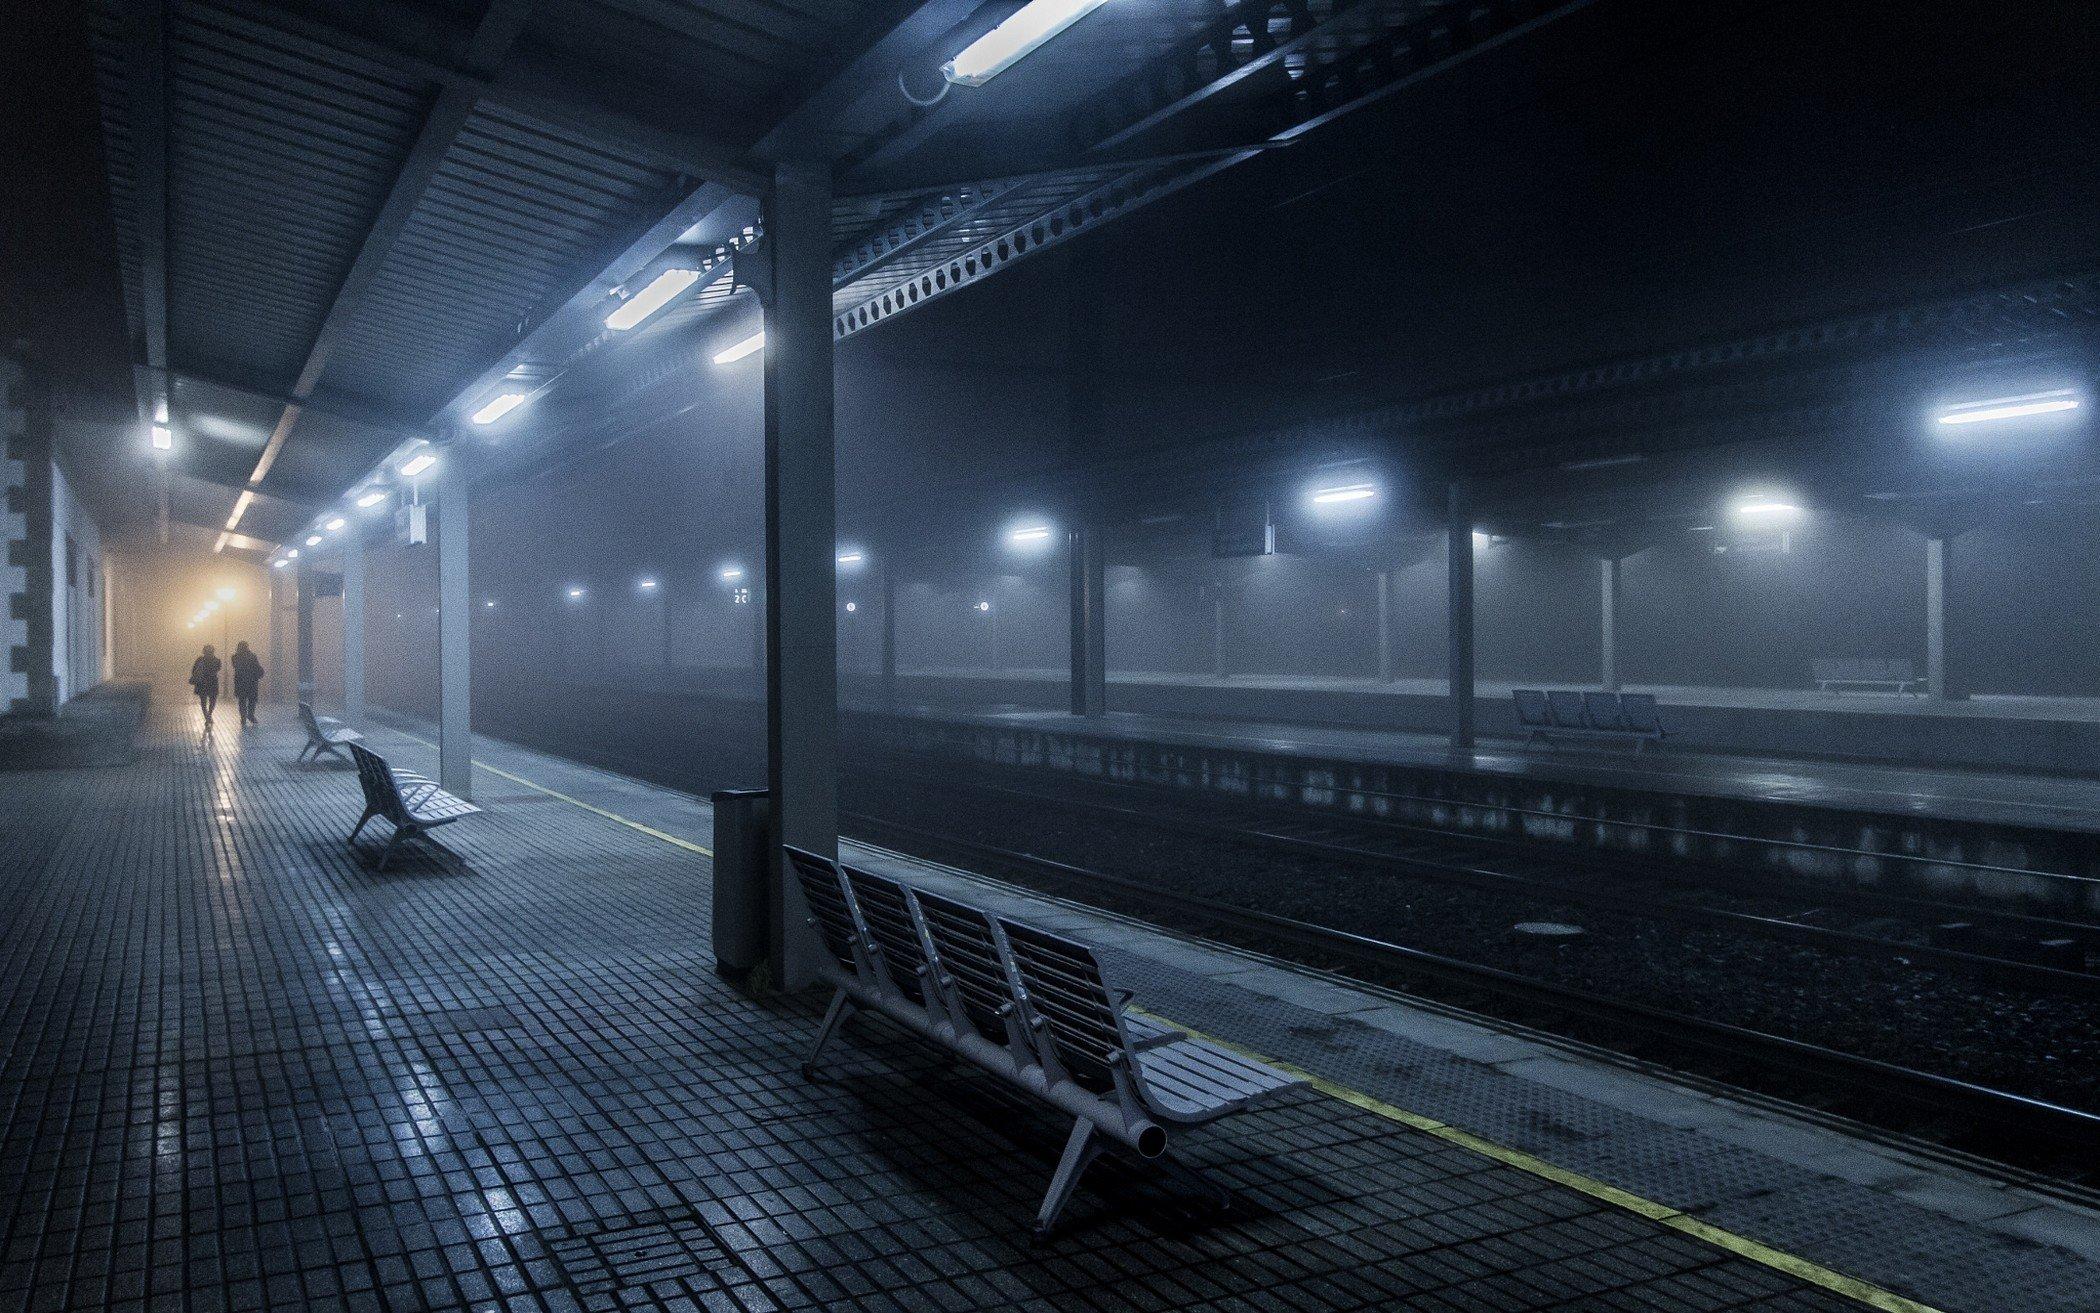 Wallpaper 2100x1313 Px Bench Blue Lights Mist Night